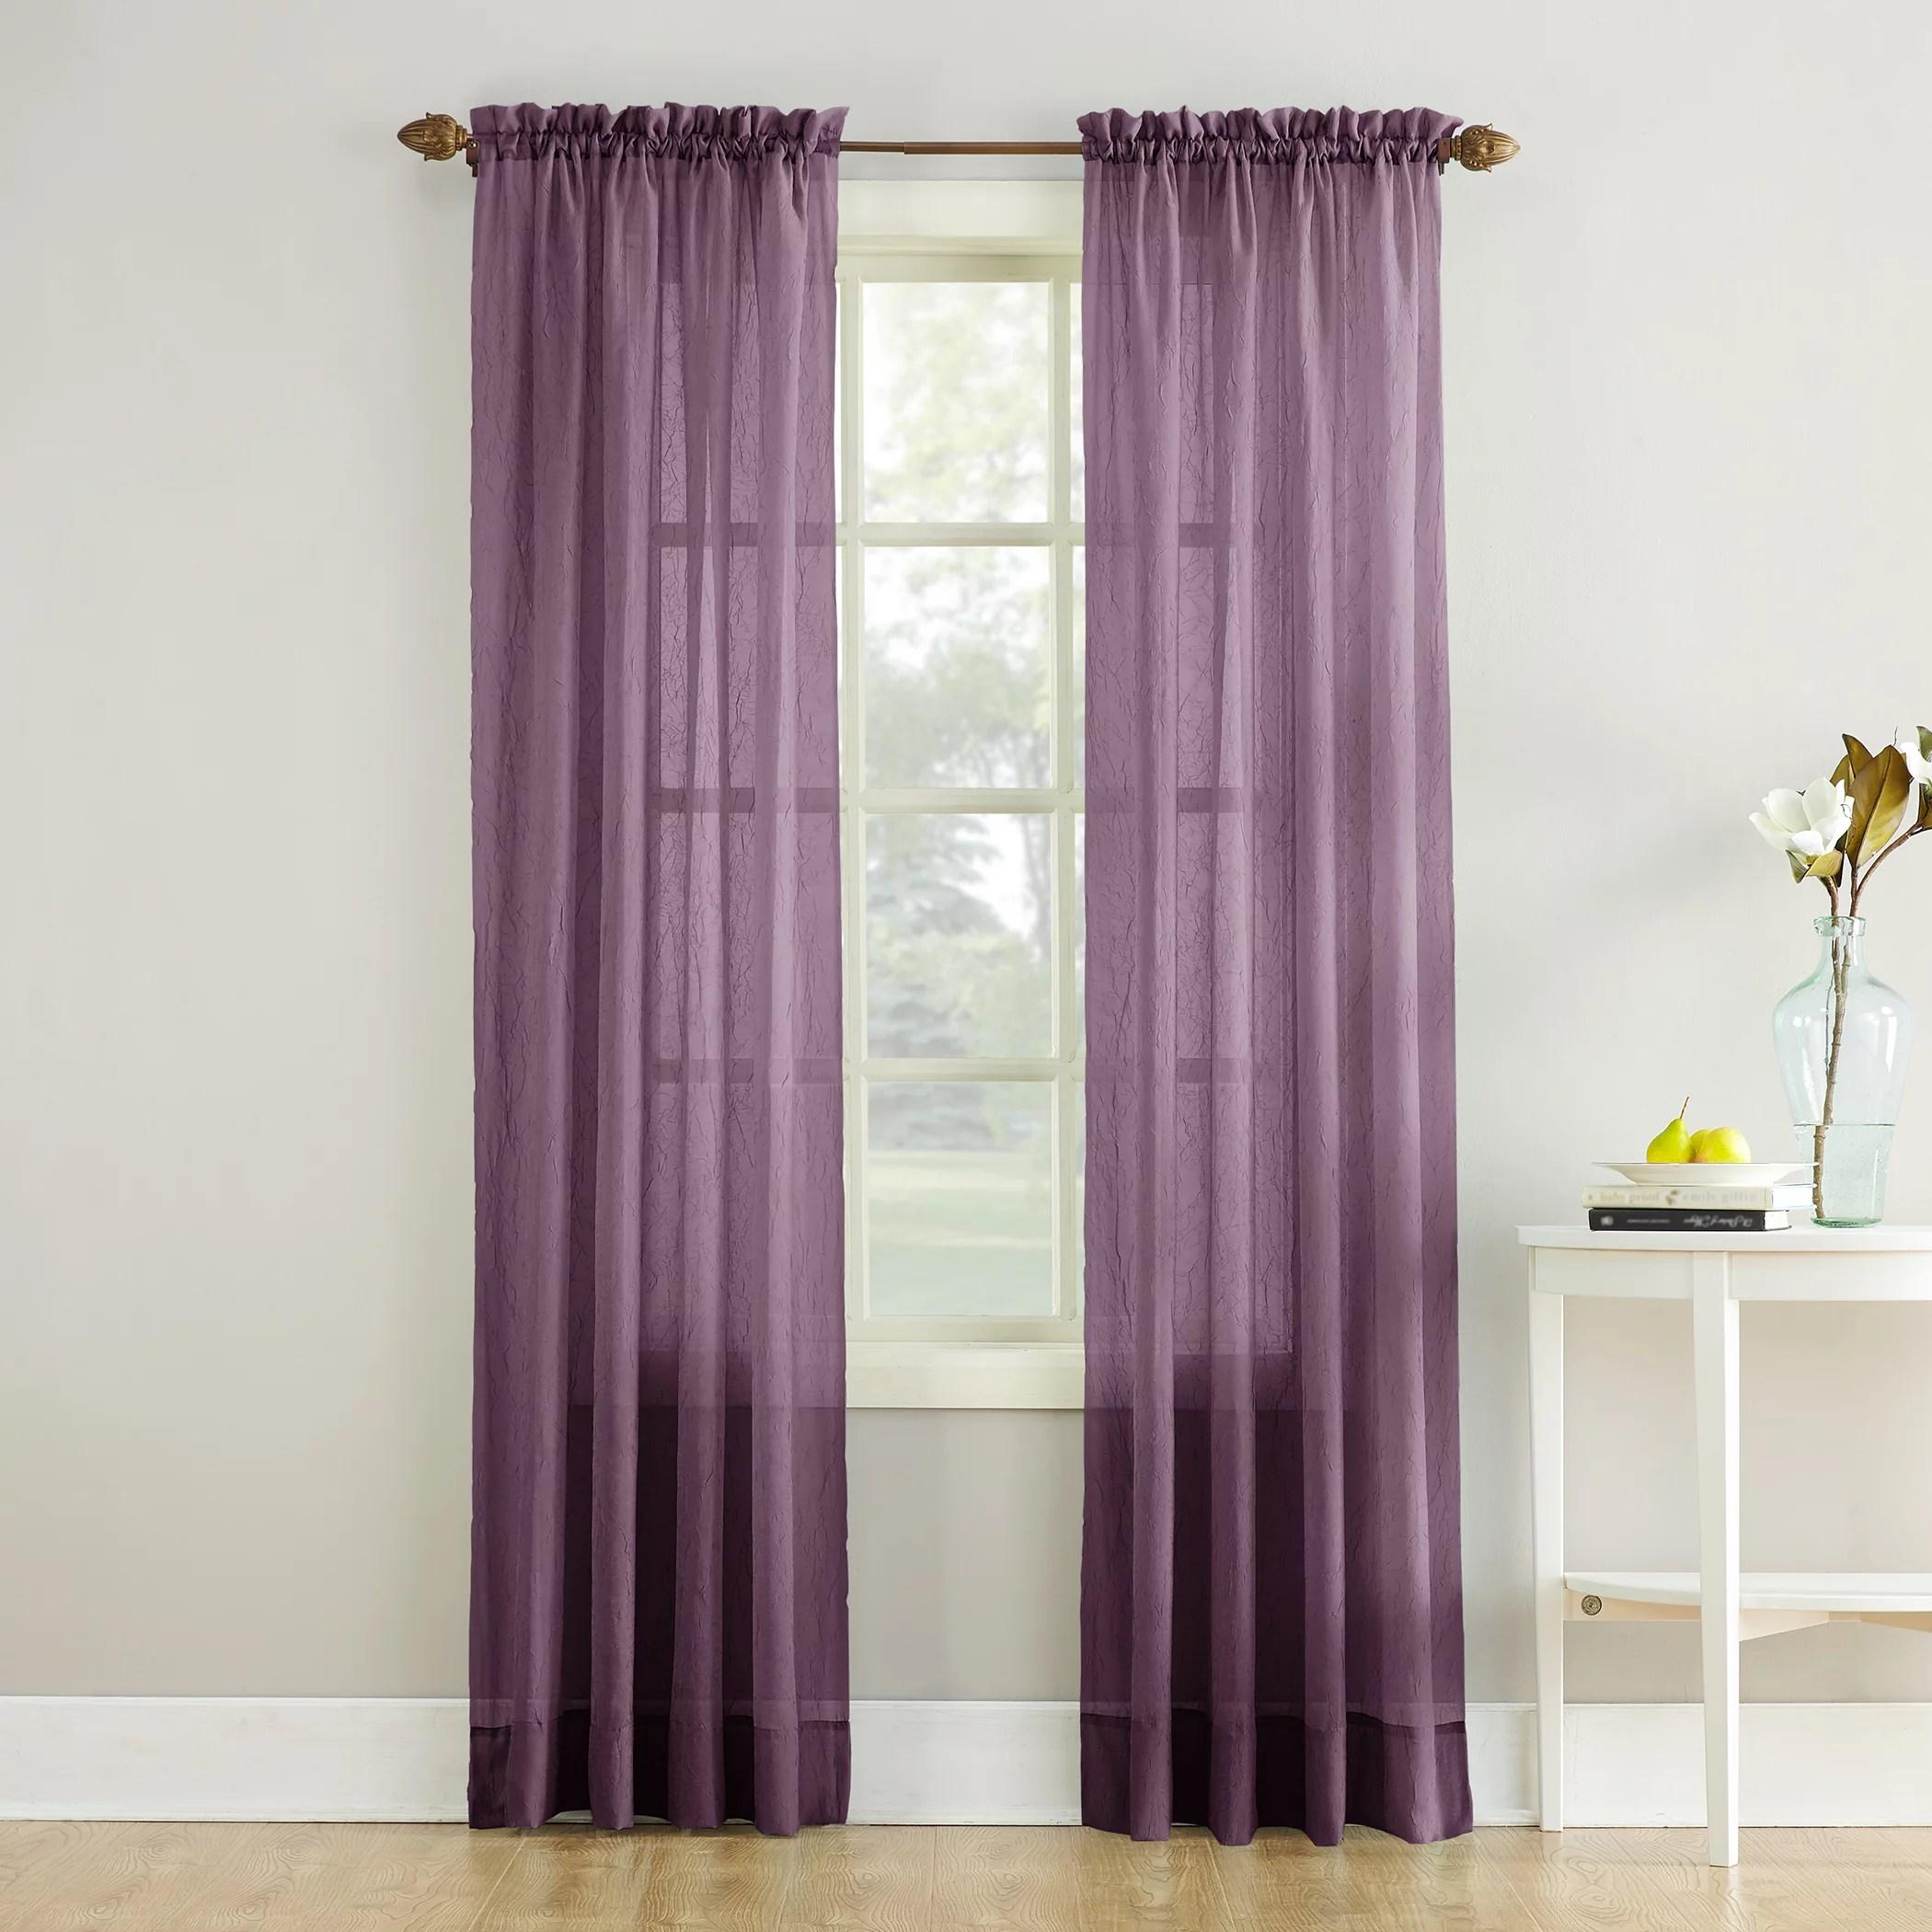 no 918 jillian crushed voile sheer rod pocket curtain panel